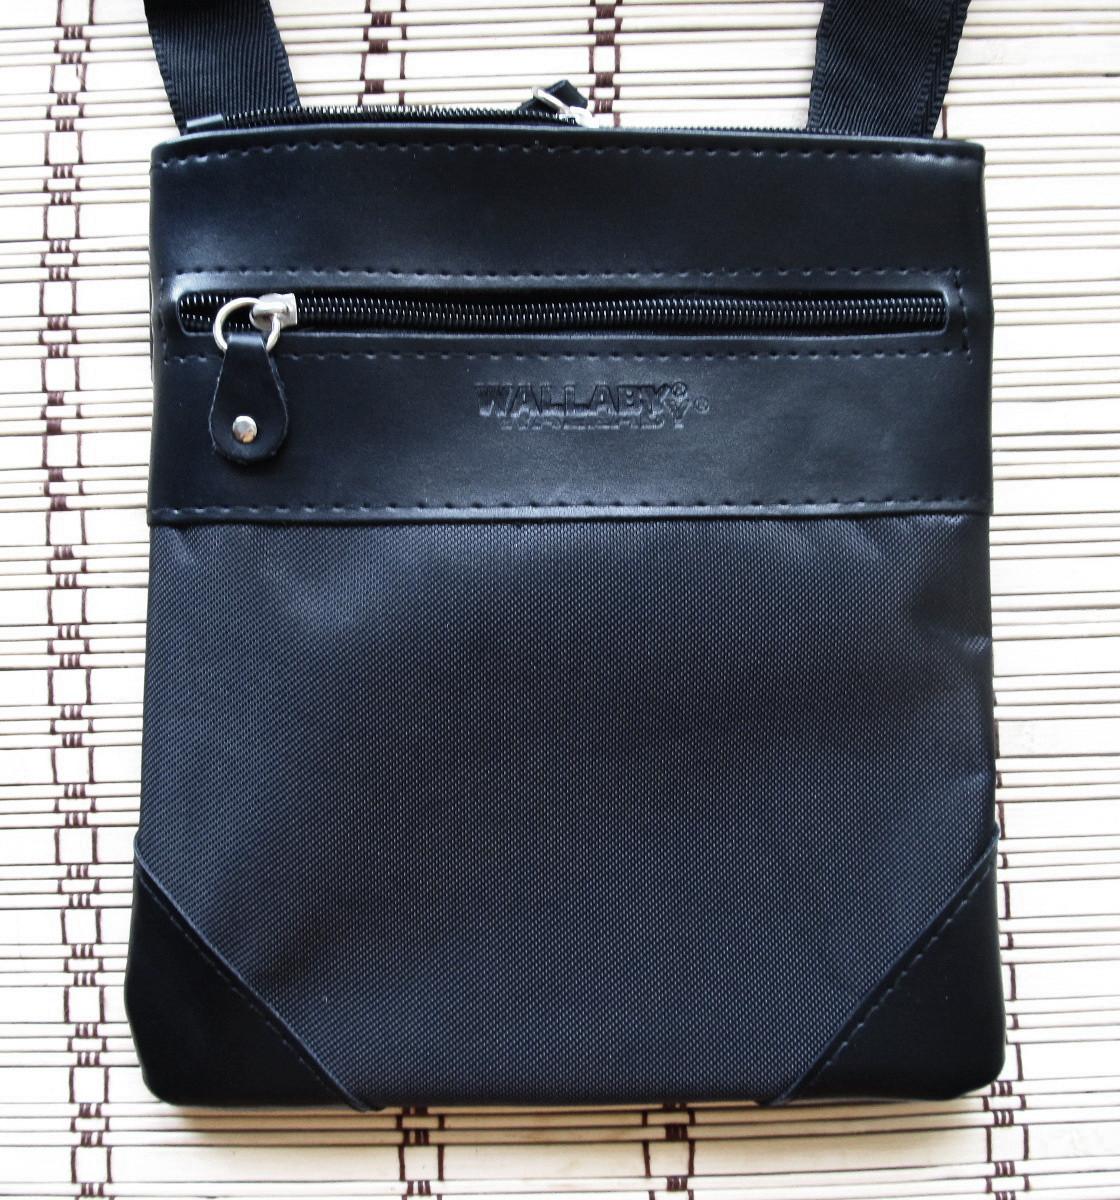 ae7ec58d3de4 Мужская сумка Wallaby 264 черная барсетка через плечо Планшет 23х20см